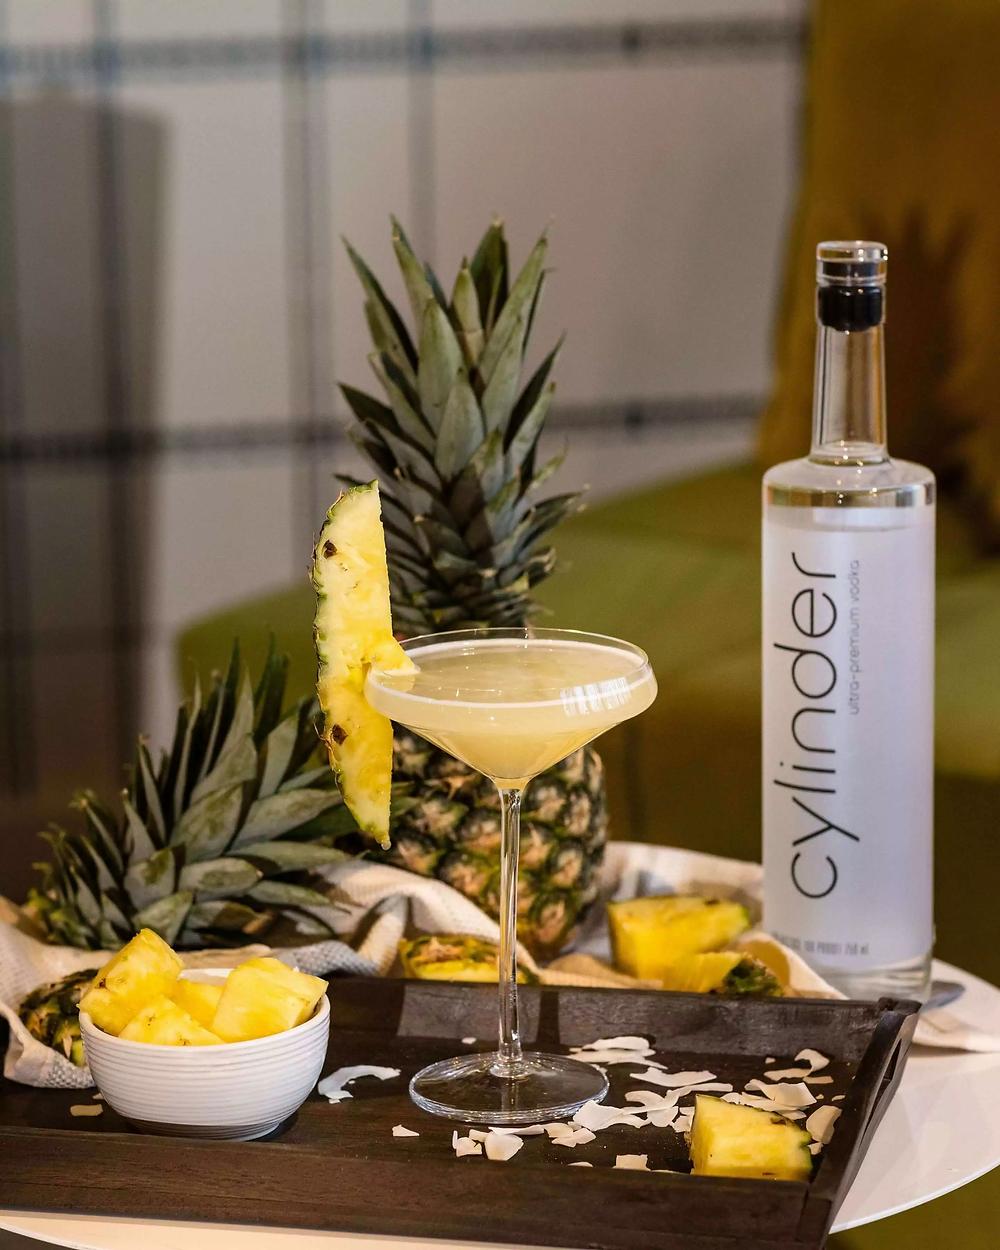 Cylinder Vodka Coconut Lychee Martini